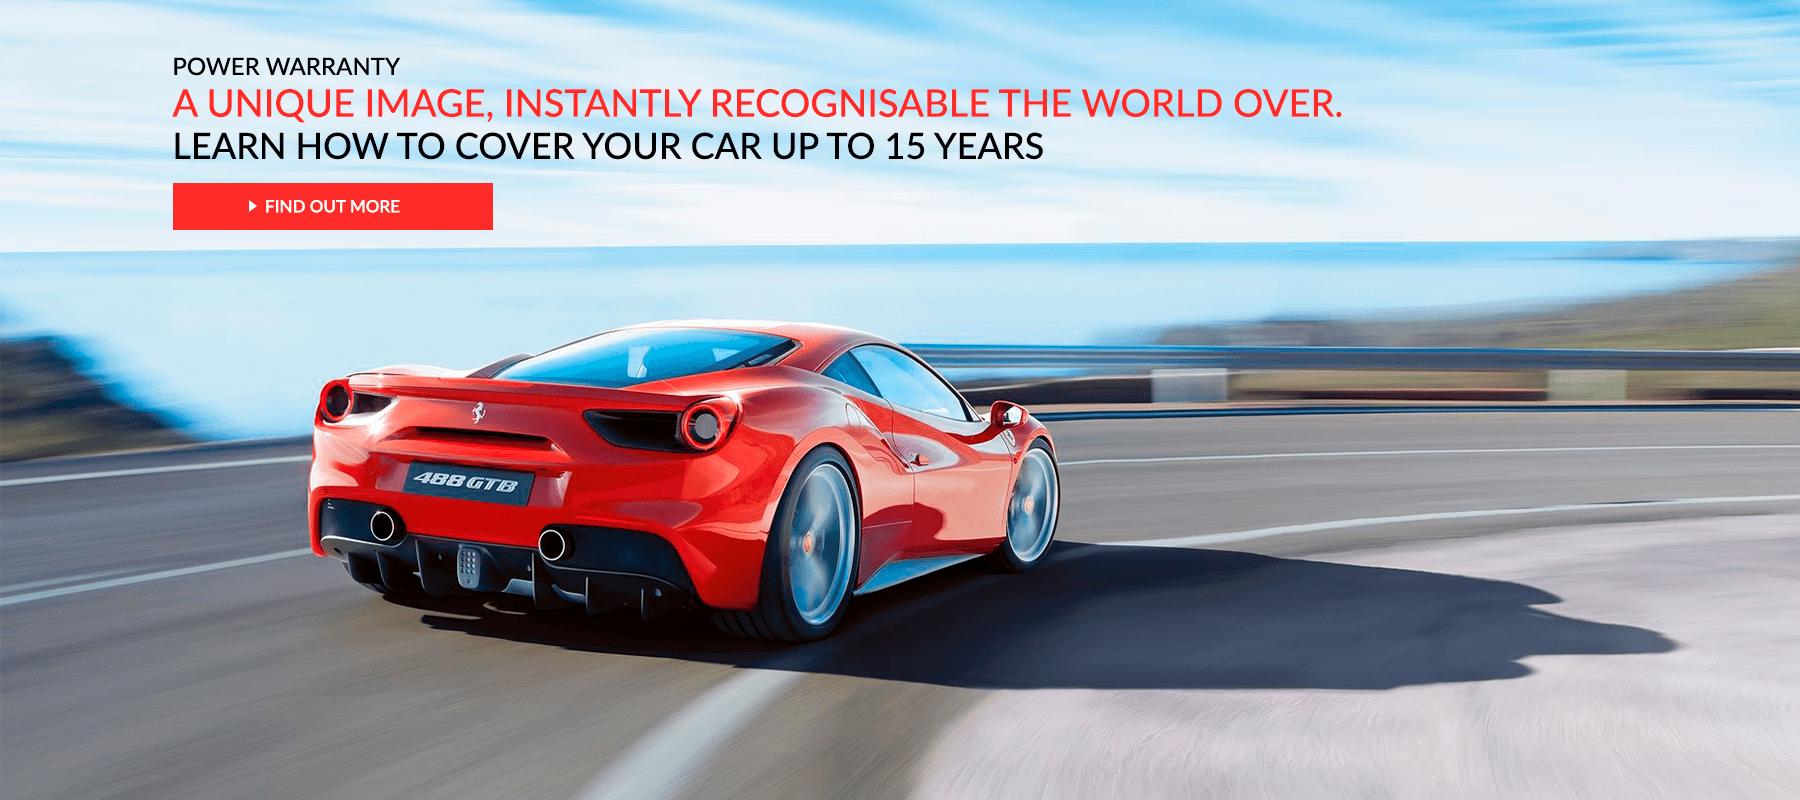 Ferrari Power Warranty